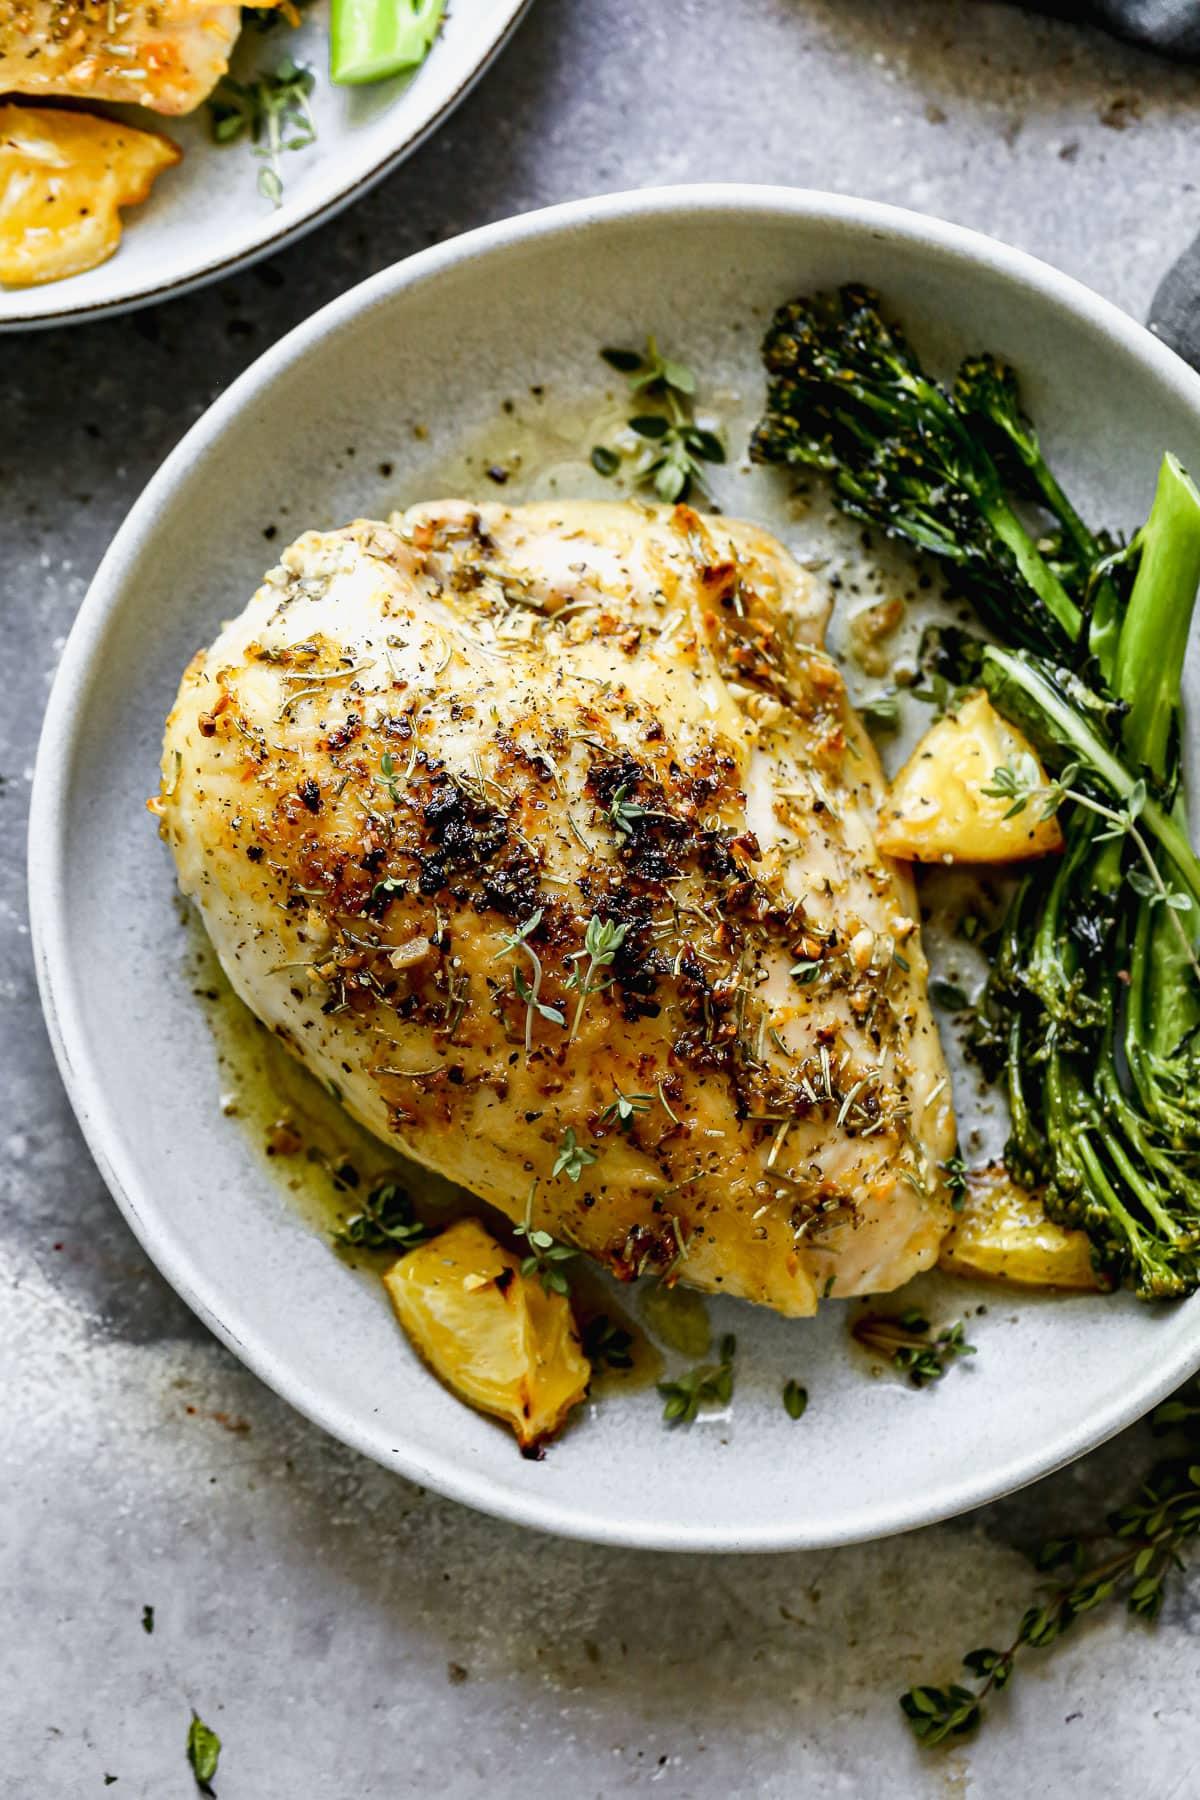 A healthy baked bone in chicken breast